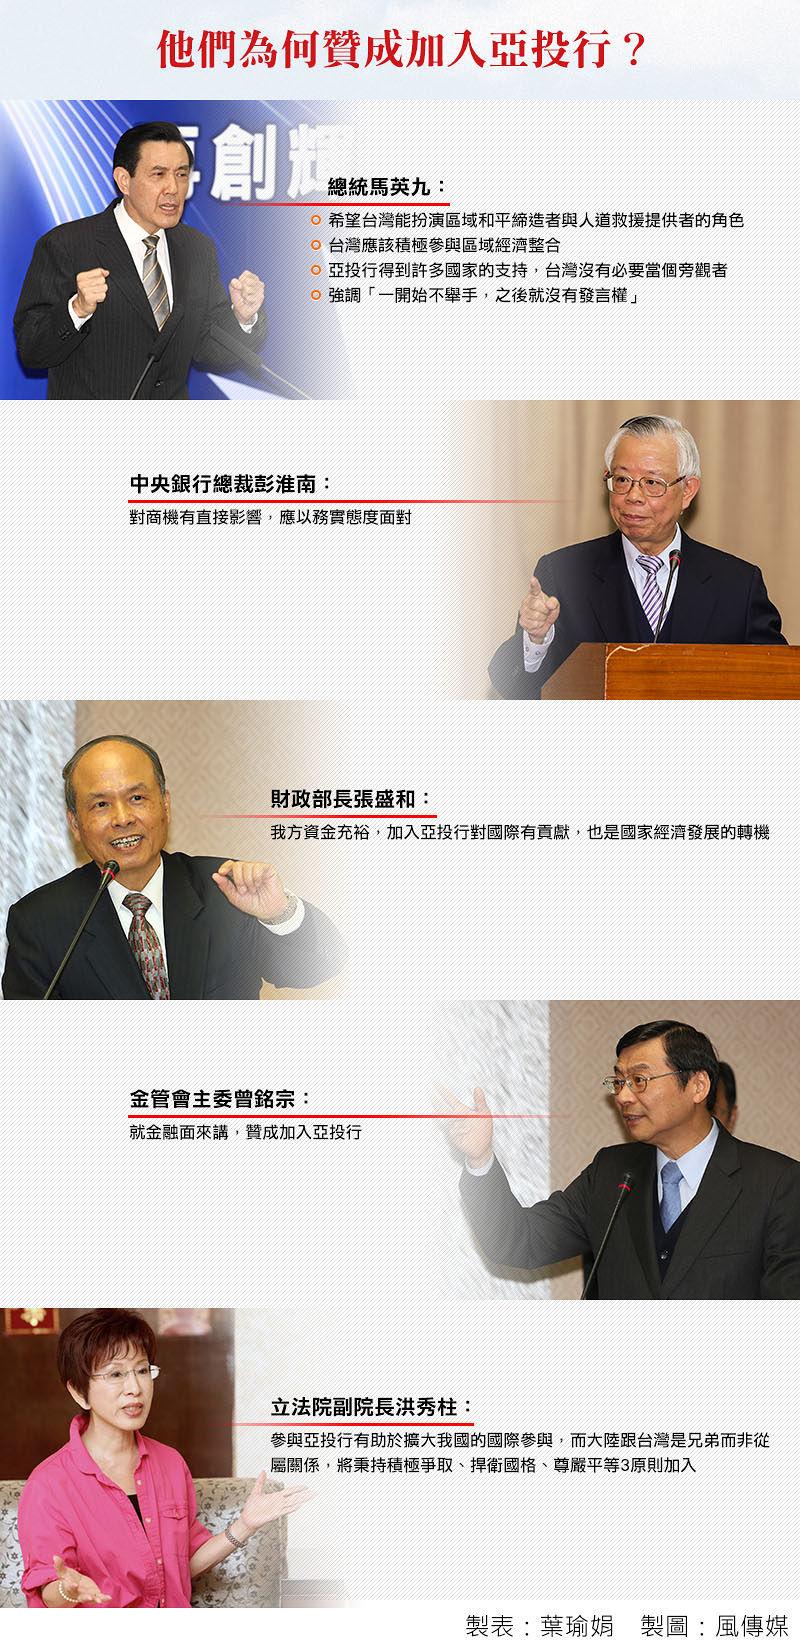 20150701-SMG0034-D01-他們為何贊成加入亞投行?.jpg